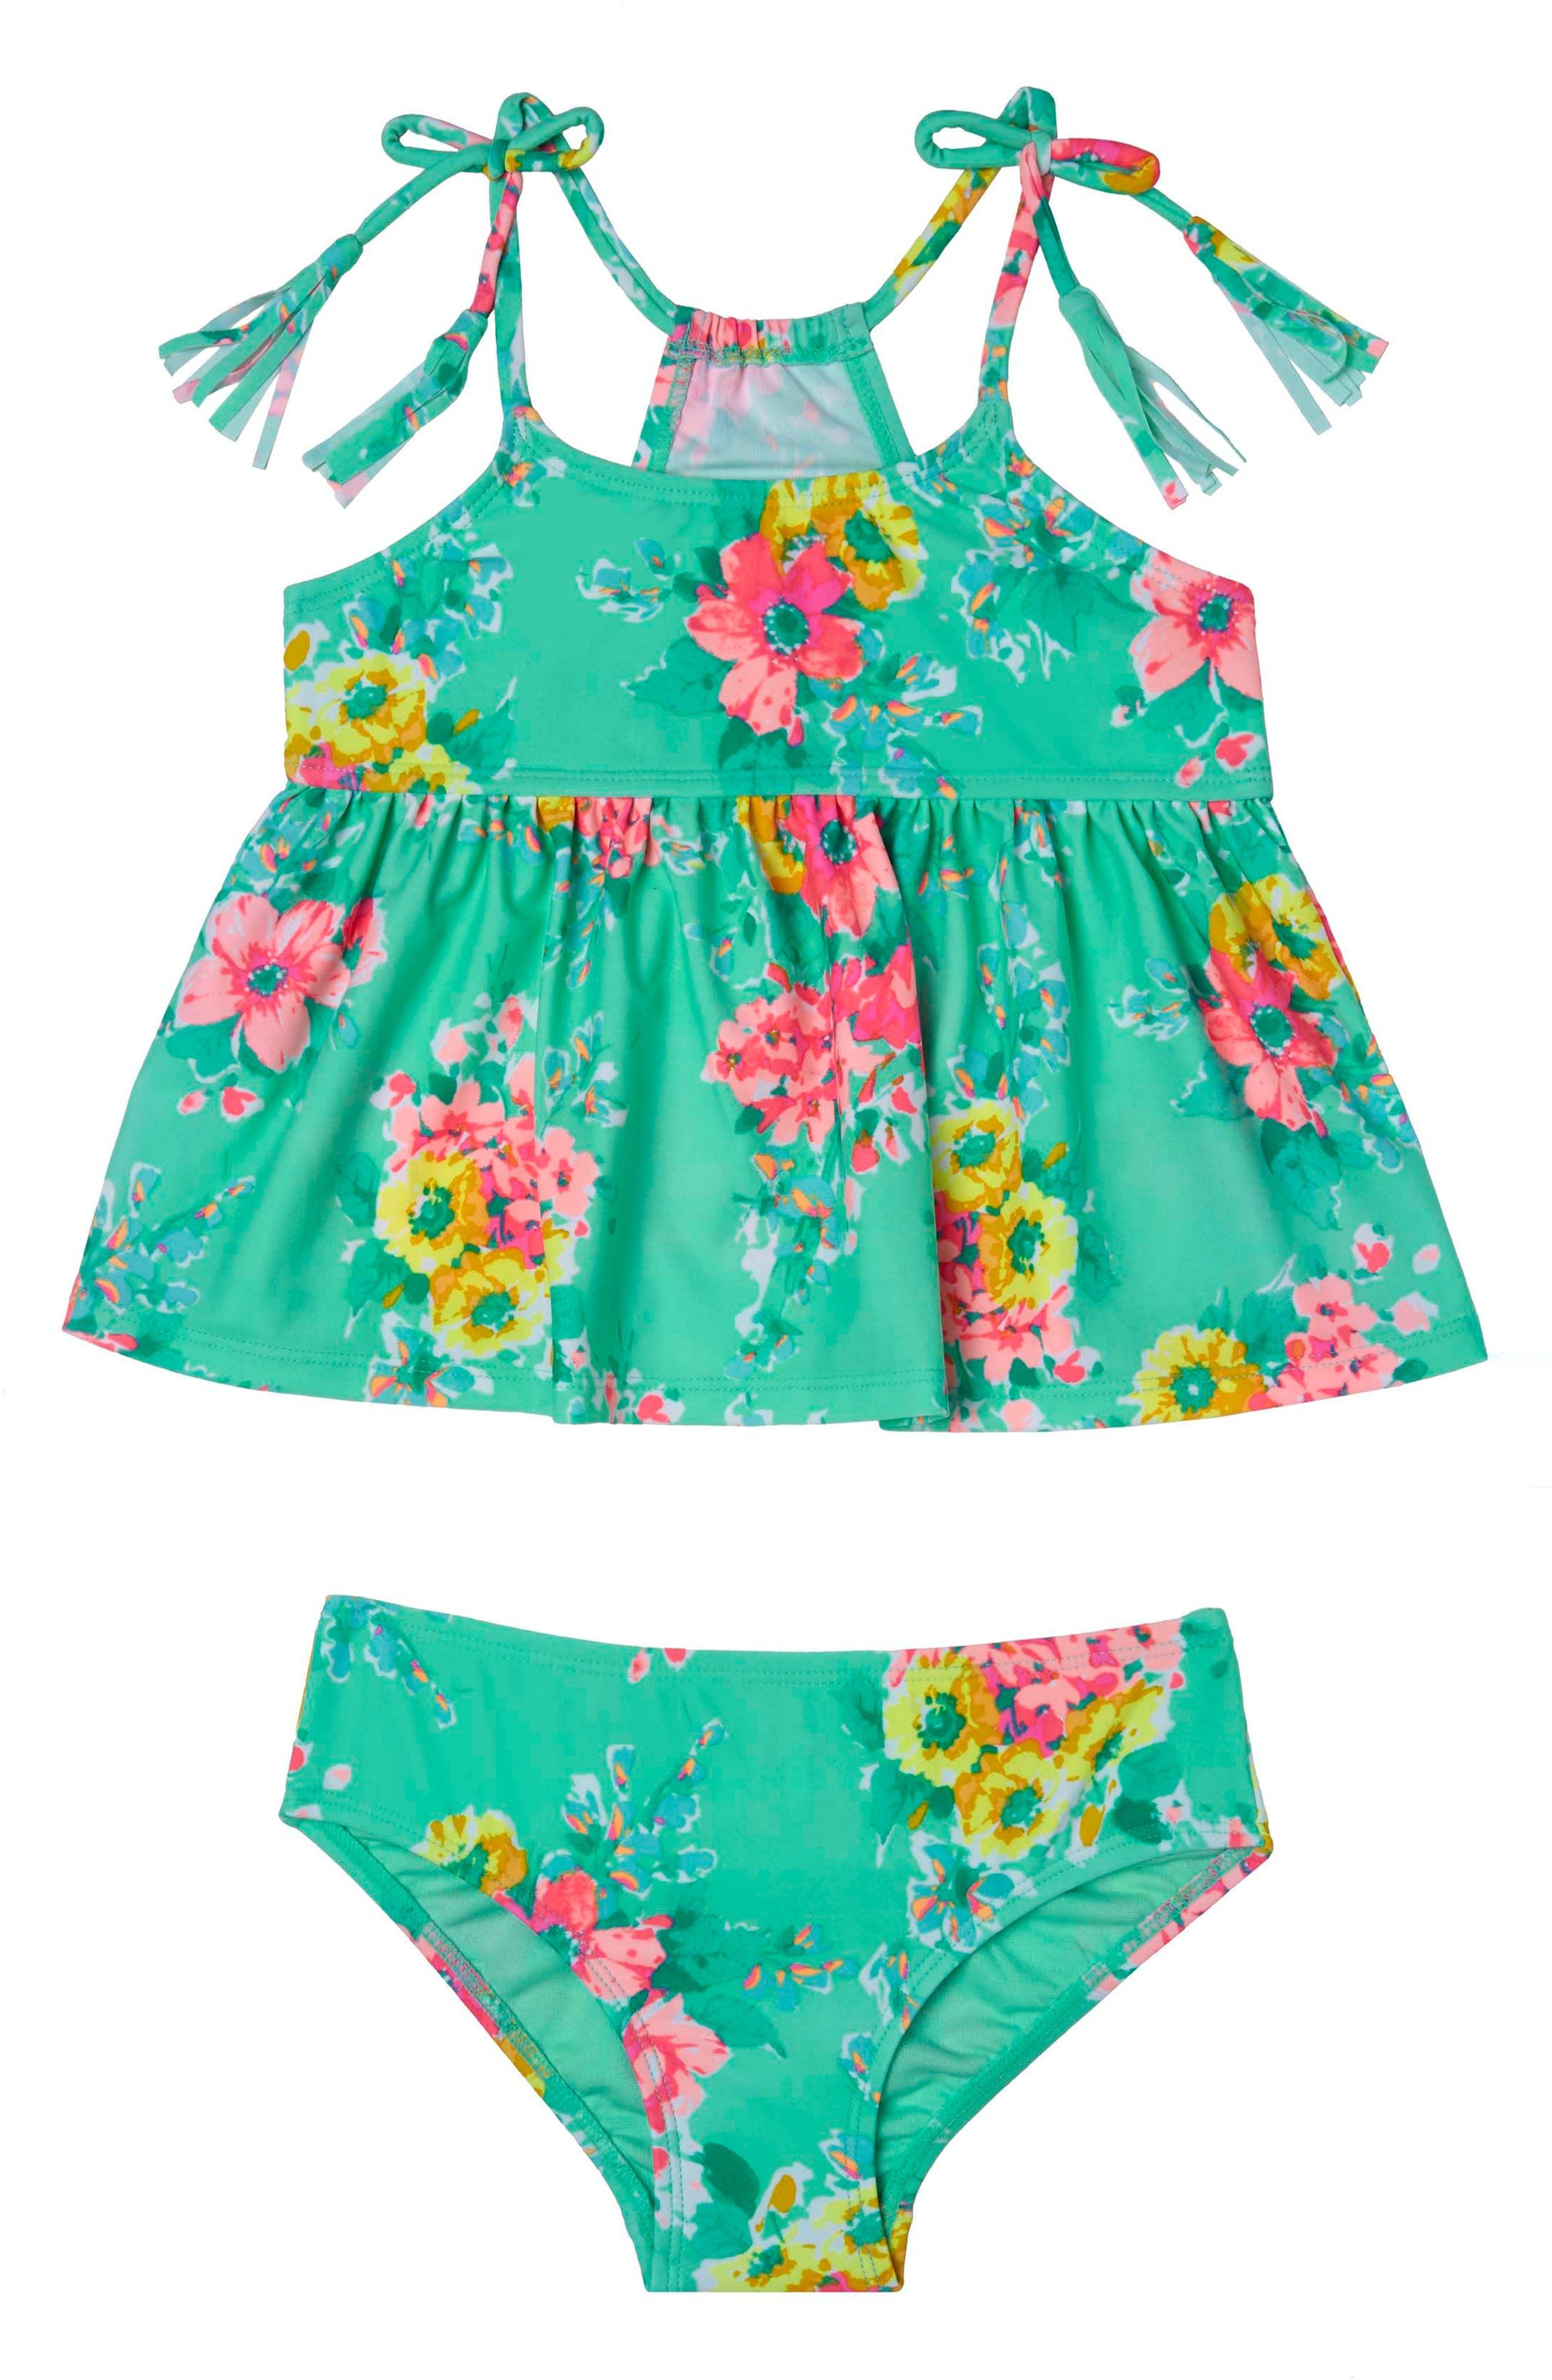 Alternate Image 1 Selected - Hula Star Garden Dream Two-Piece Swimsuit (Toddler Girls & Little Girls)